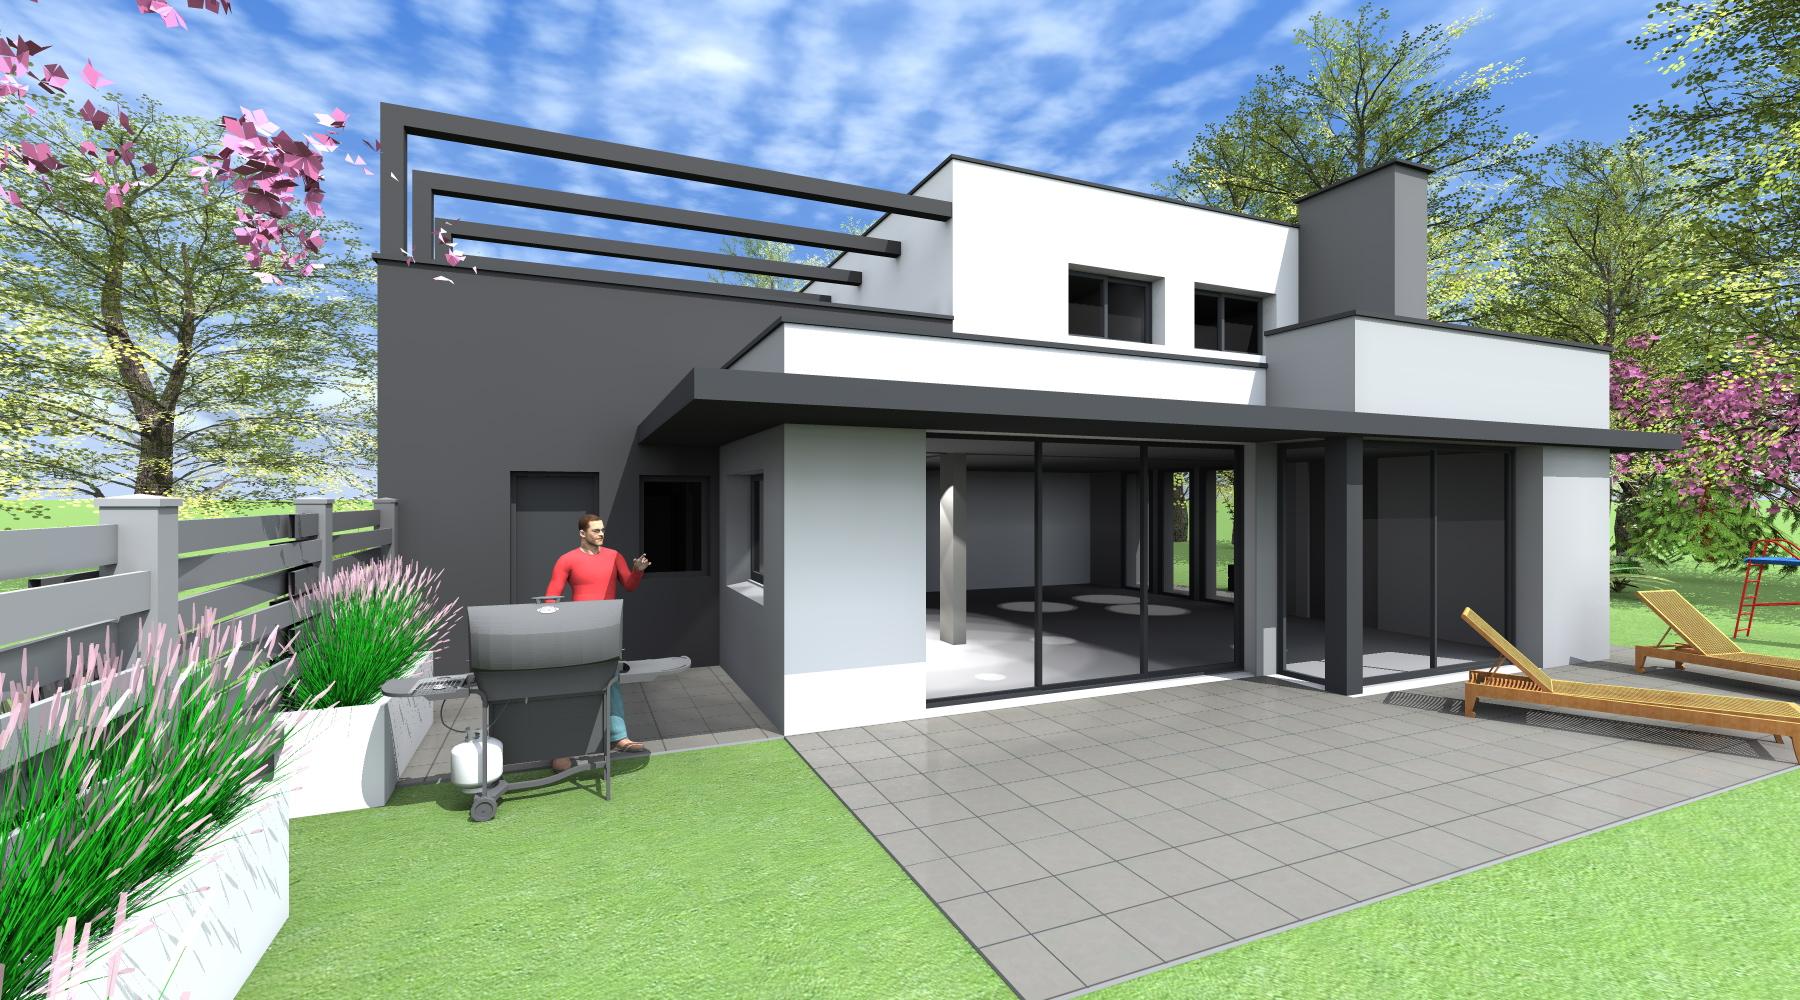 Maison neuve architecte rennes 1 2 vue lise roturier for Maison moderne rennes